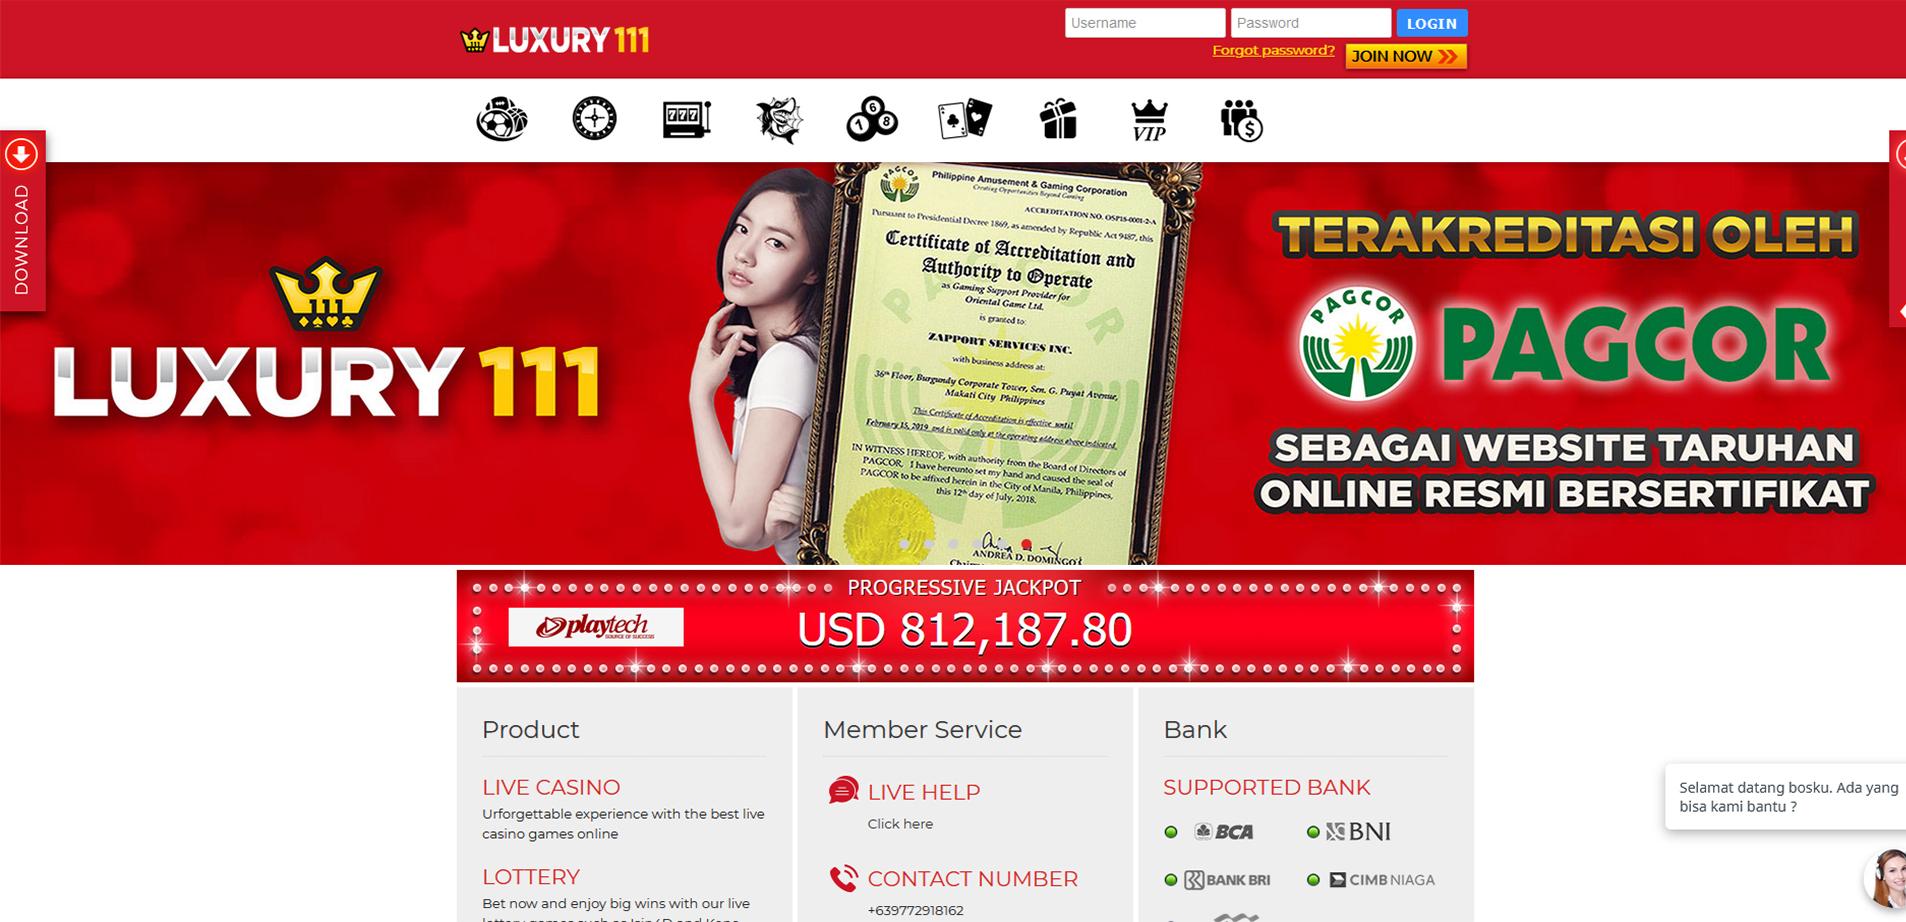 Luxury111 Agen Judi Online & Bandar Bola Online Terbesar